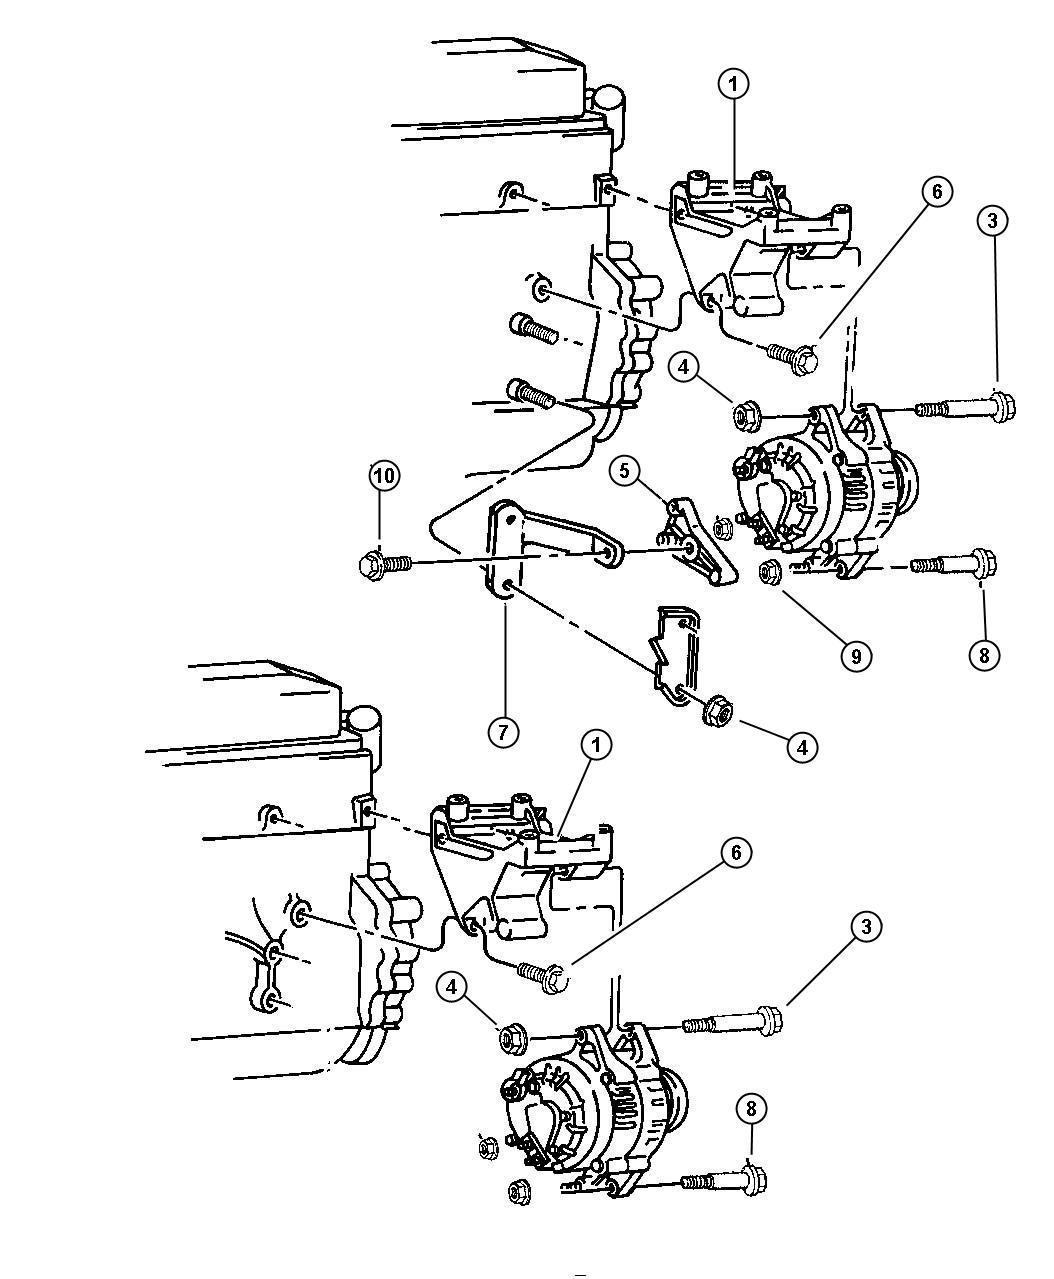 00i53510 Jeep Comp Alternator Wiring Diagram on jeep steering column diagram, jeep heater diagram, 1-wire alternator diagram, starter solenoid wiring diagram, 3 wire alternator diagram, alternator connections diagram, jeep cherokee alternator, jeep exhaust diagram, jeep voltage regulator diagram, 4 wire alternator diagram, jeep alternator generator, jeep alternator connector, jeep starter relay, jeep wrangler alternator, jeep parts, jeep alternator repair, jeep starter diagram, jeep seat belt diagram, jeep electrical diagram, alternator schematic diagram,